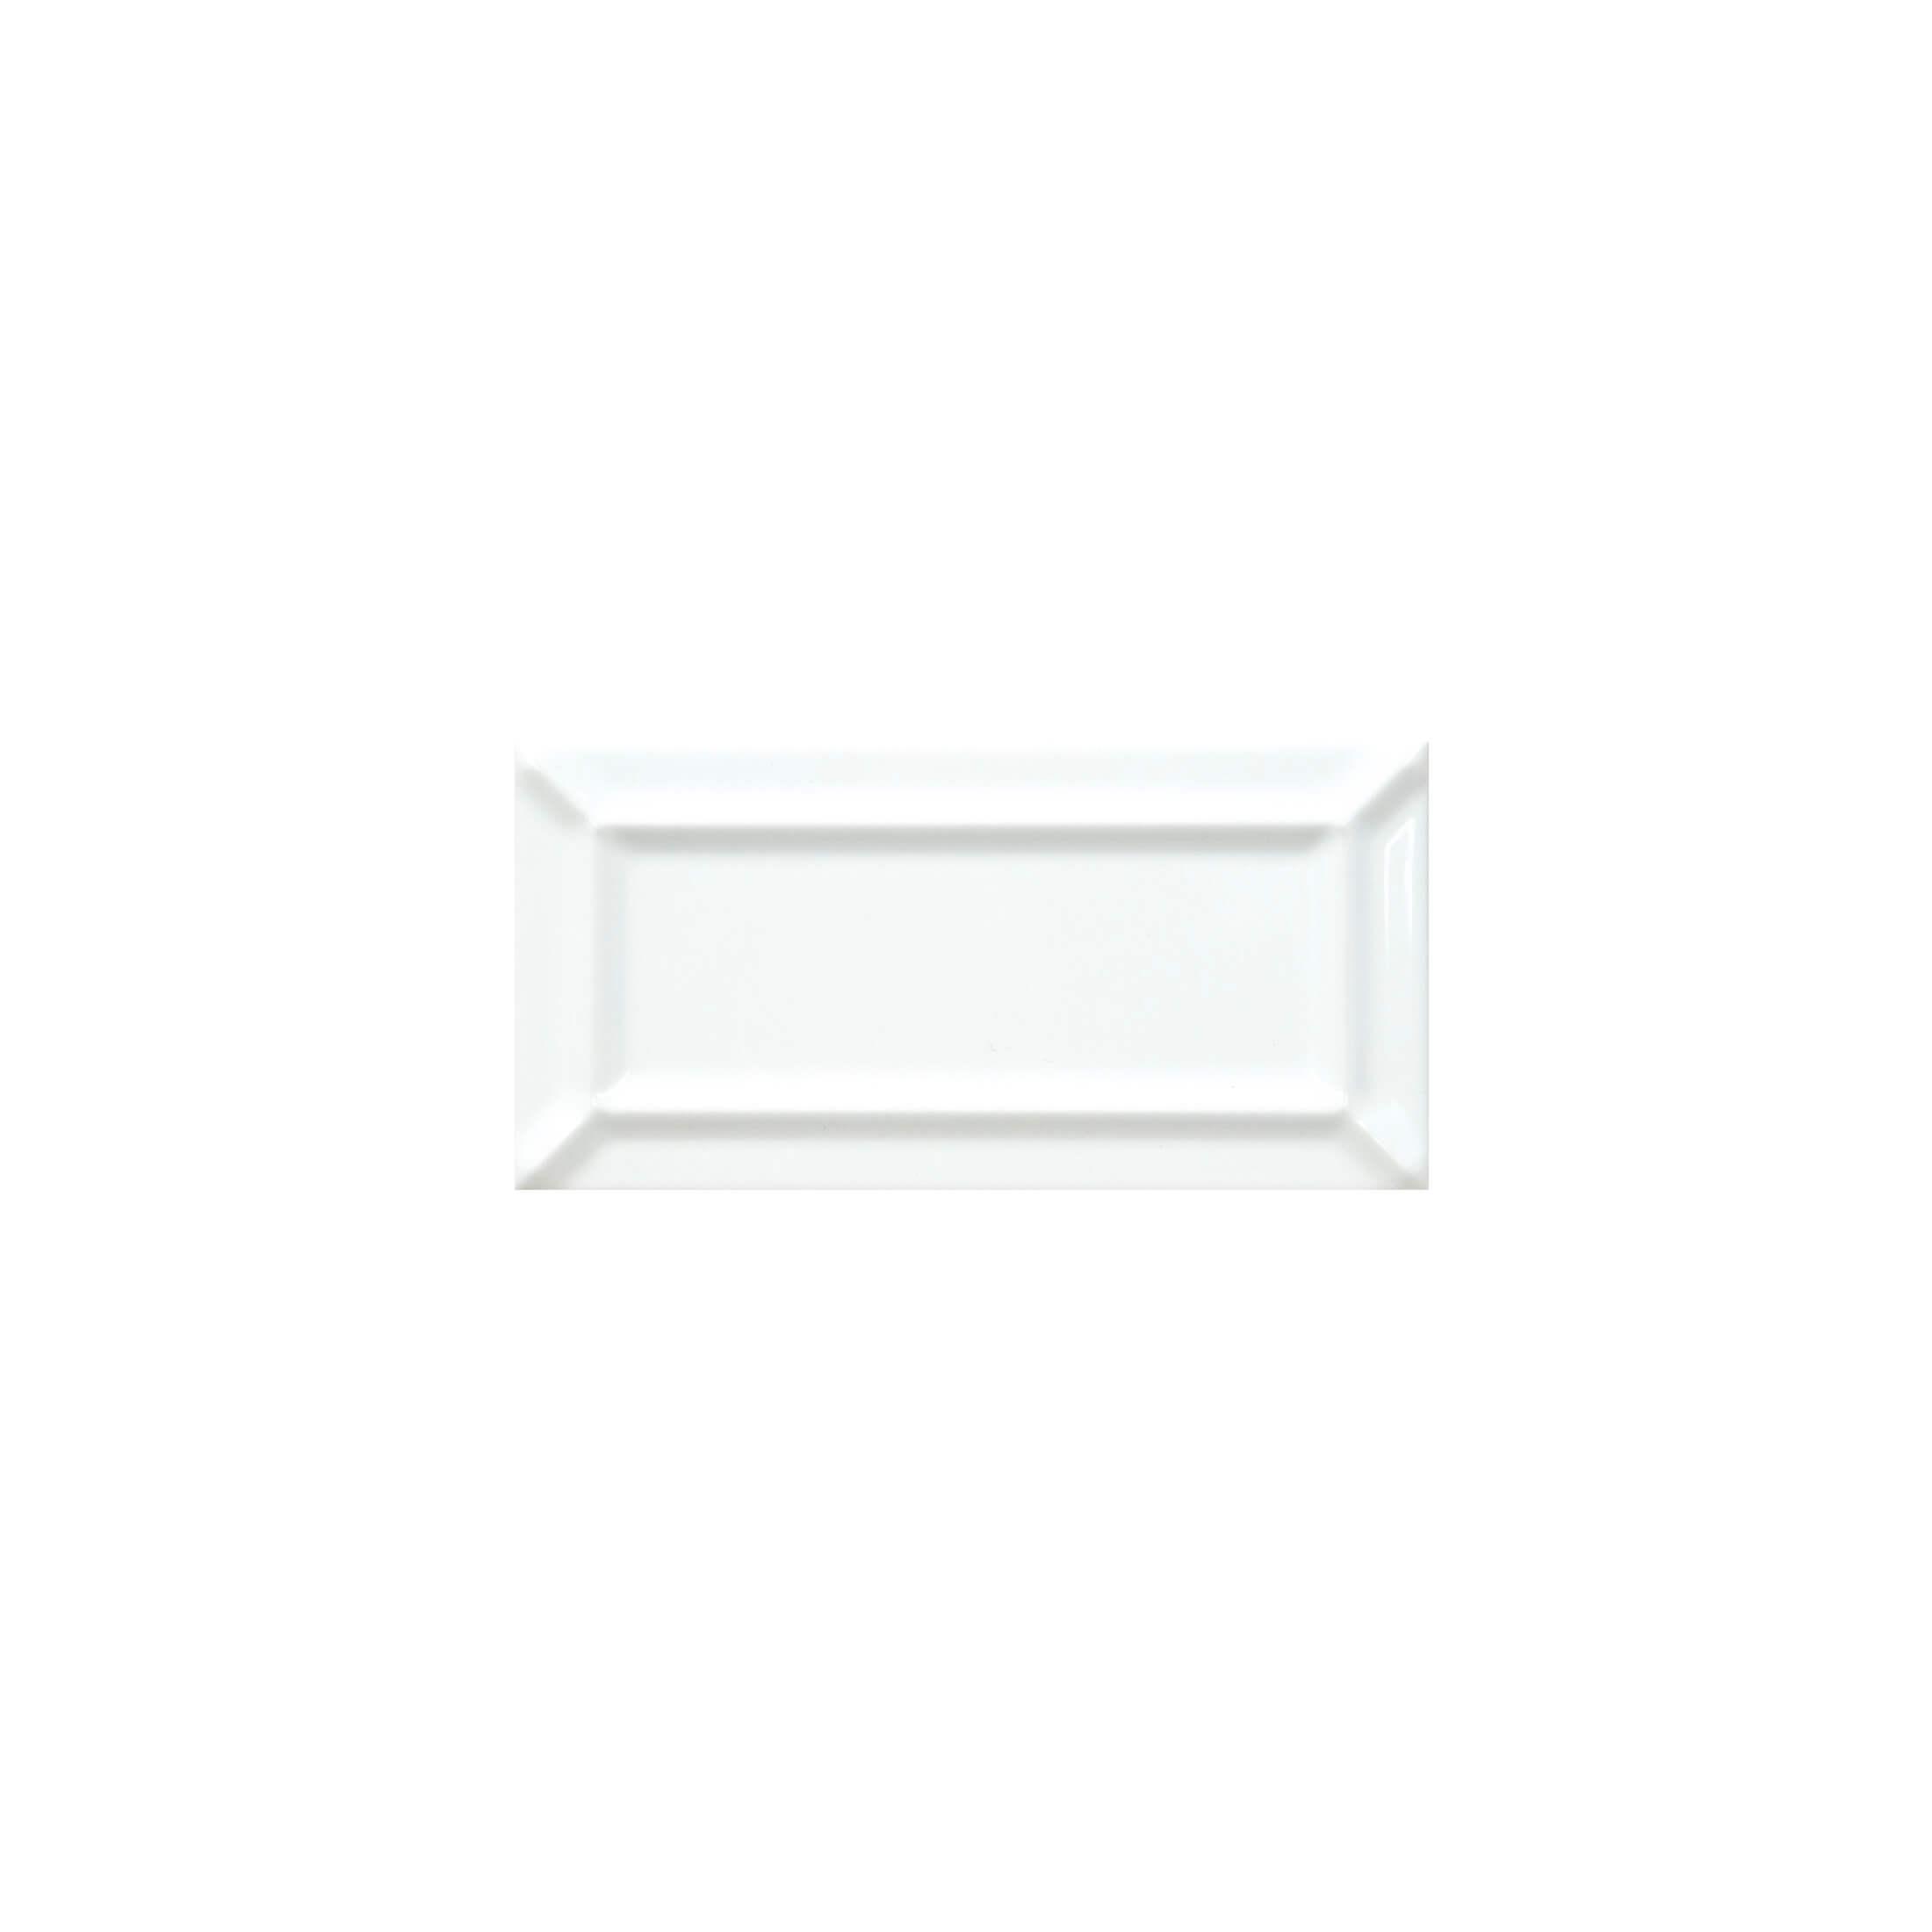 ADNE1103 - LISO EDGE - 7.5 cm X 15 cm